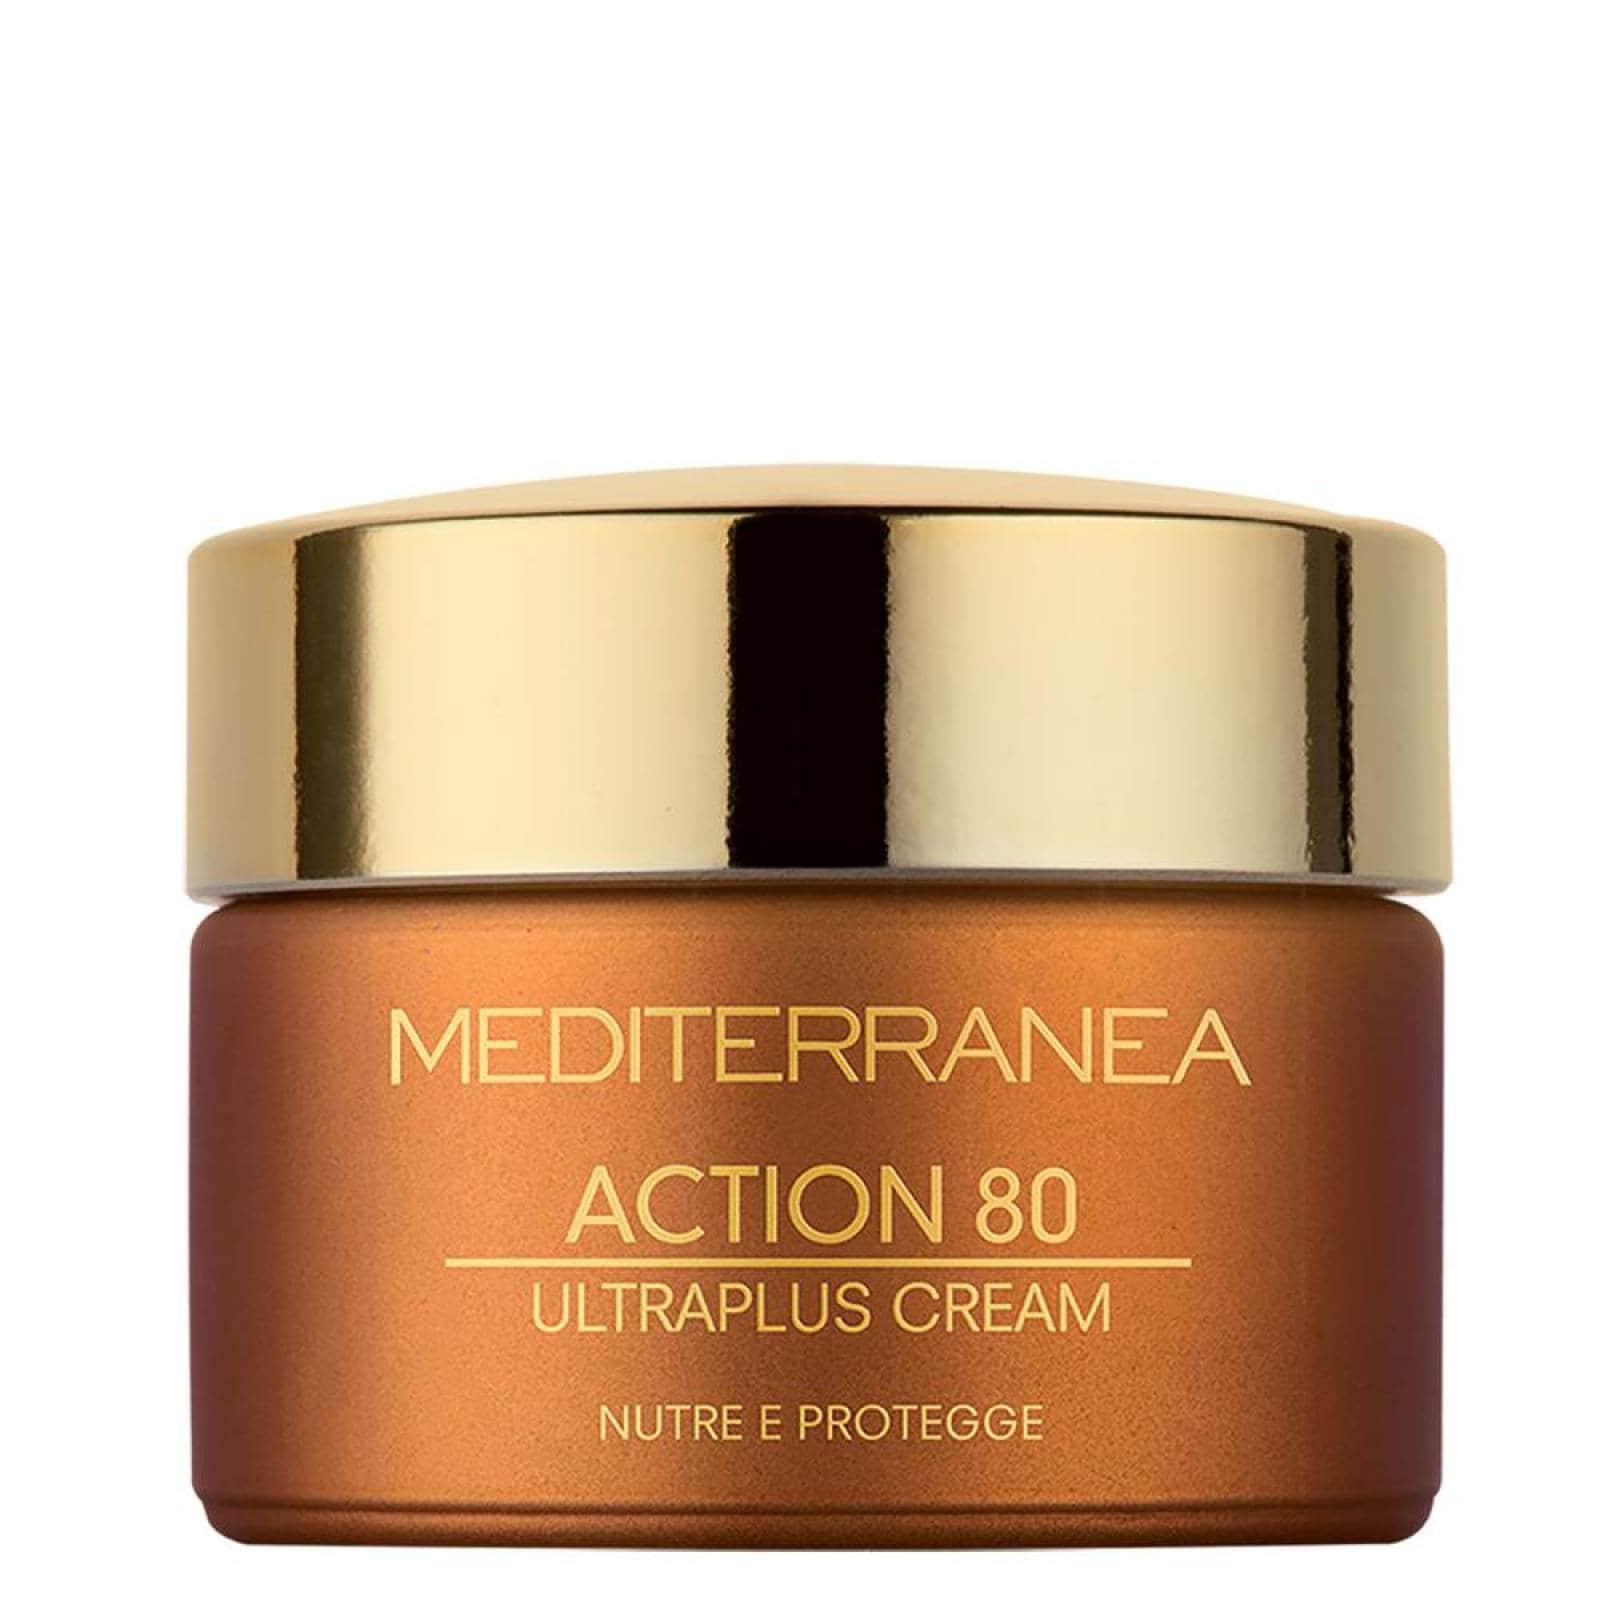 Action 80 Crema Ultra Plus